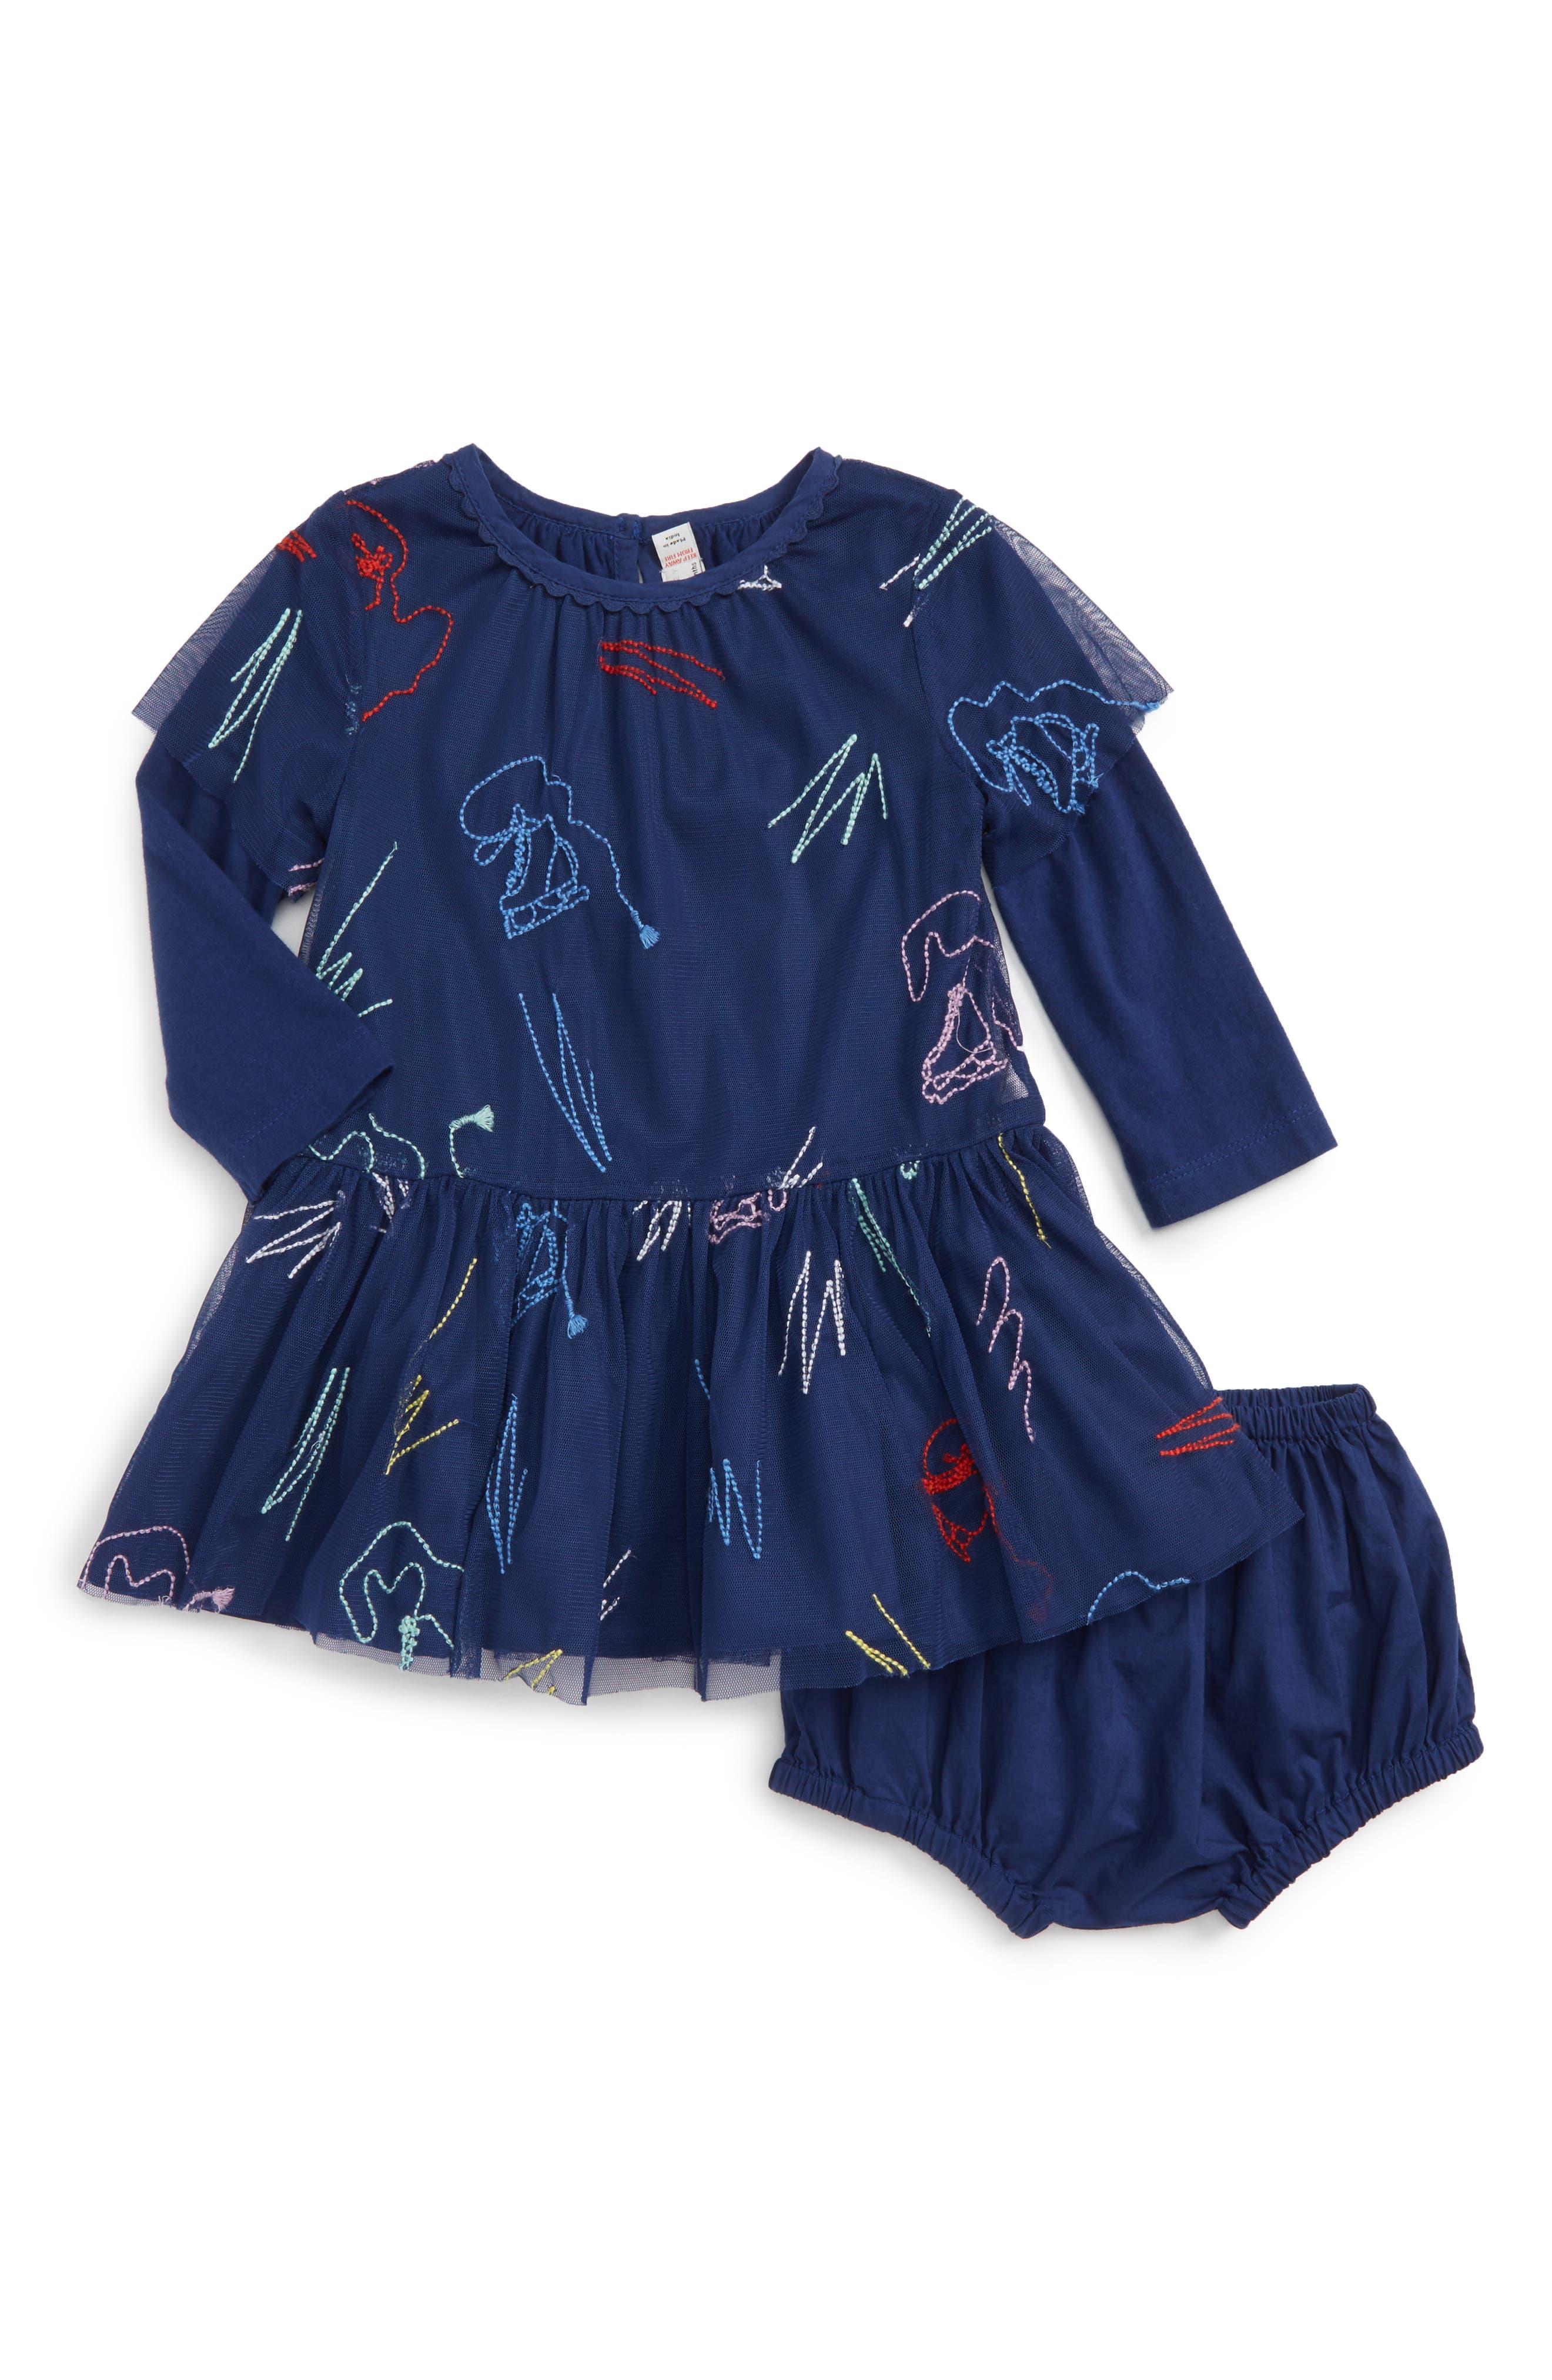 Main Image - Stella McCartney Kids Embroidered Tulle Dress (Baby Girls)